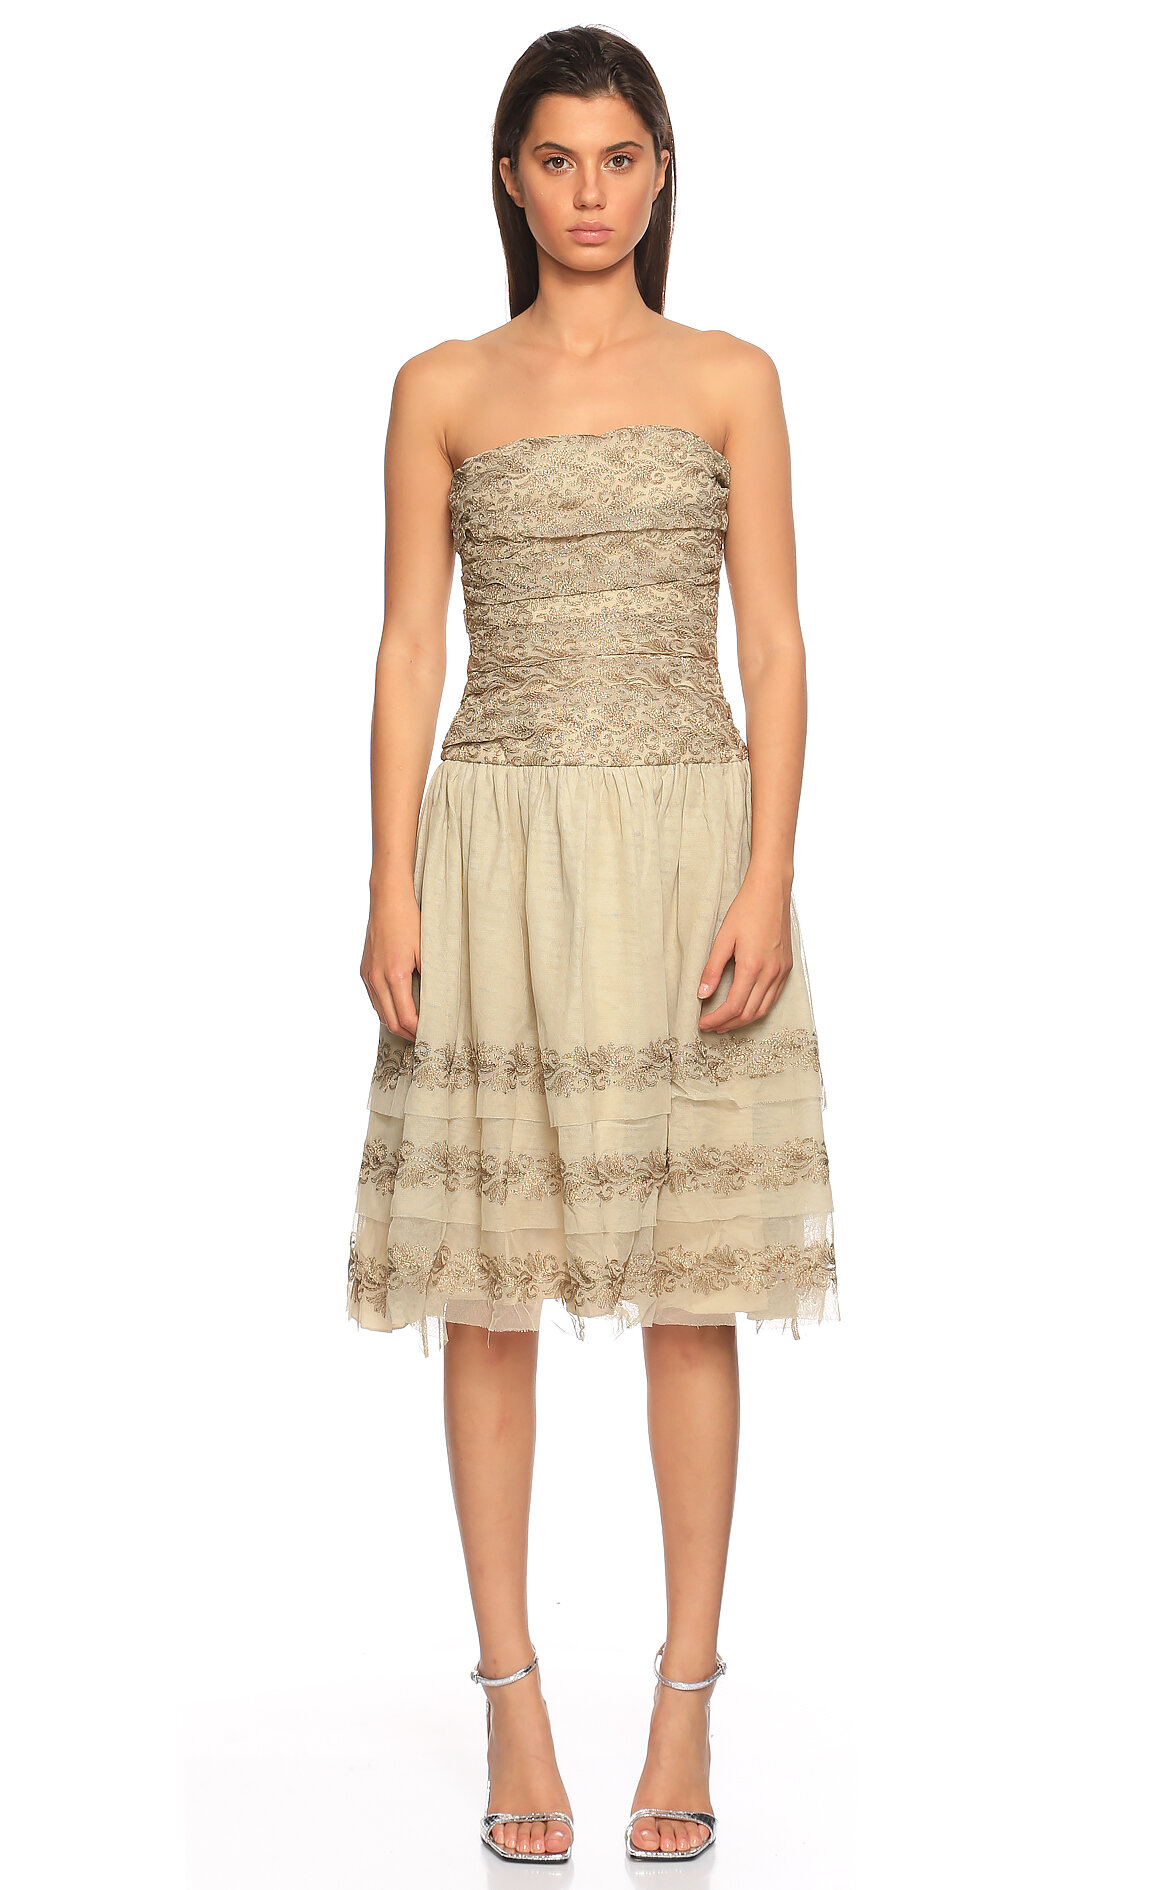 Ralph Lauren Black Label-Ralph Lauren Black Label İşleme Detaylı Straplez Elbise